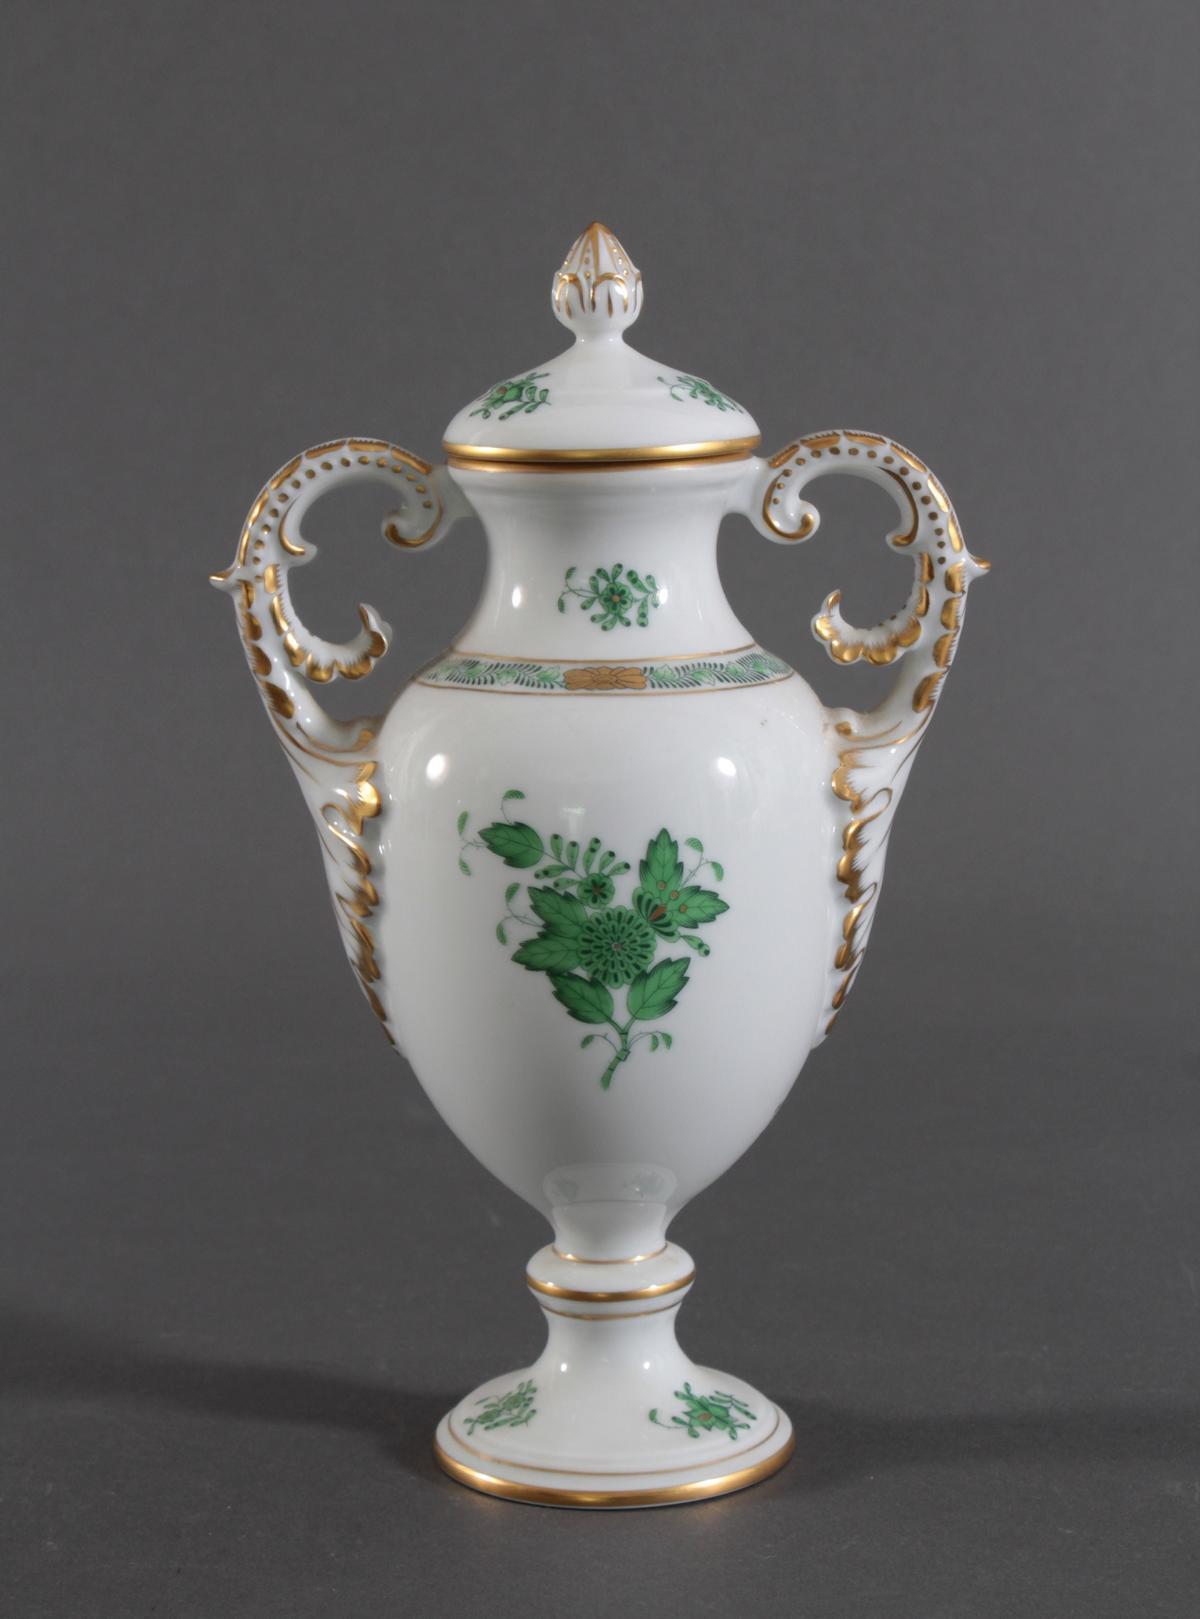 Amphorenvase Herend im Dekor Appony grün-3